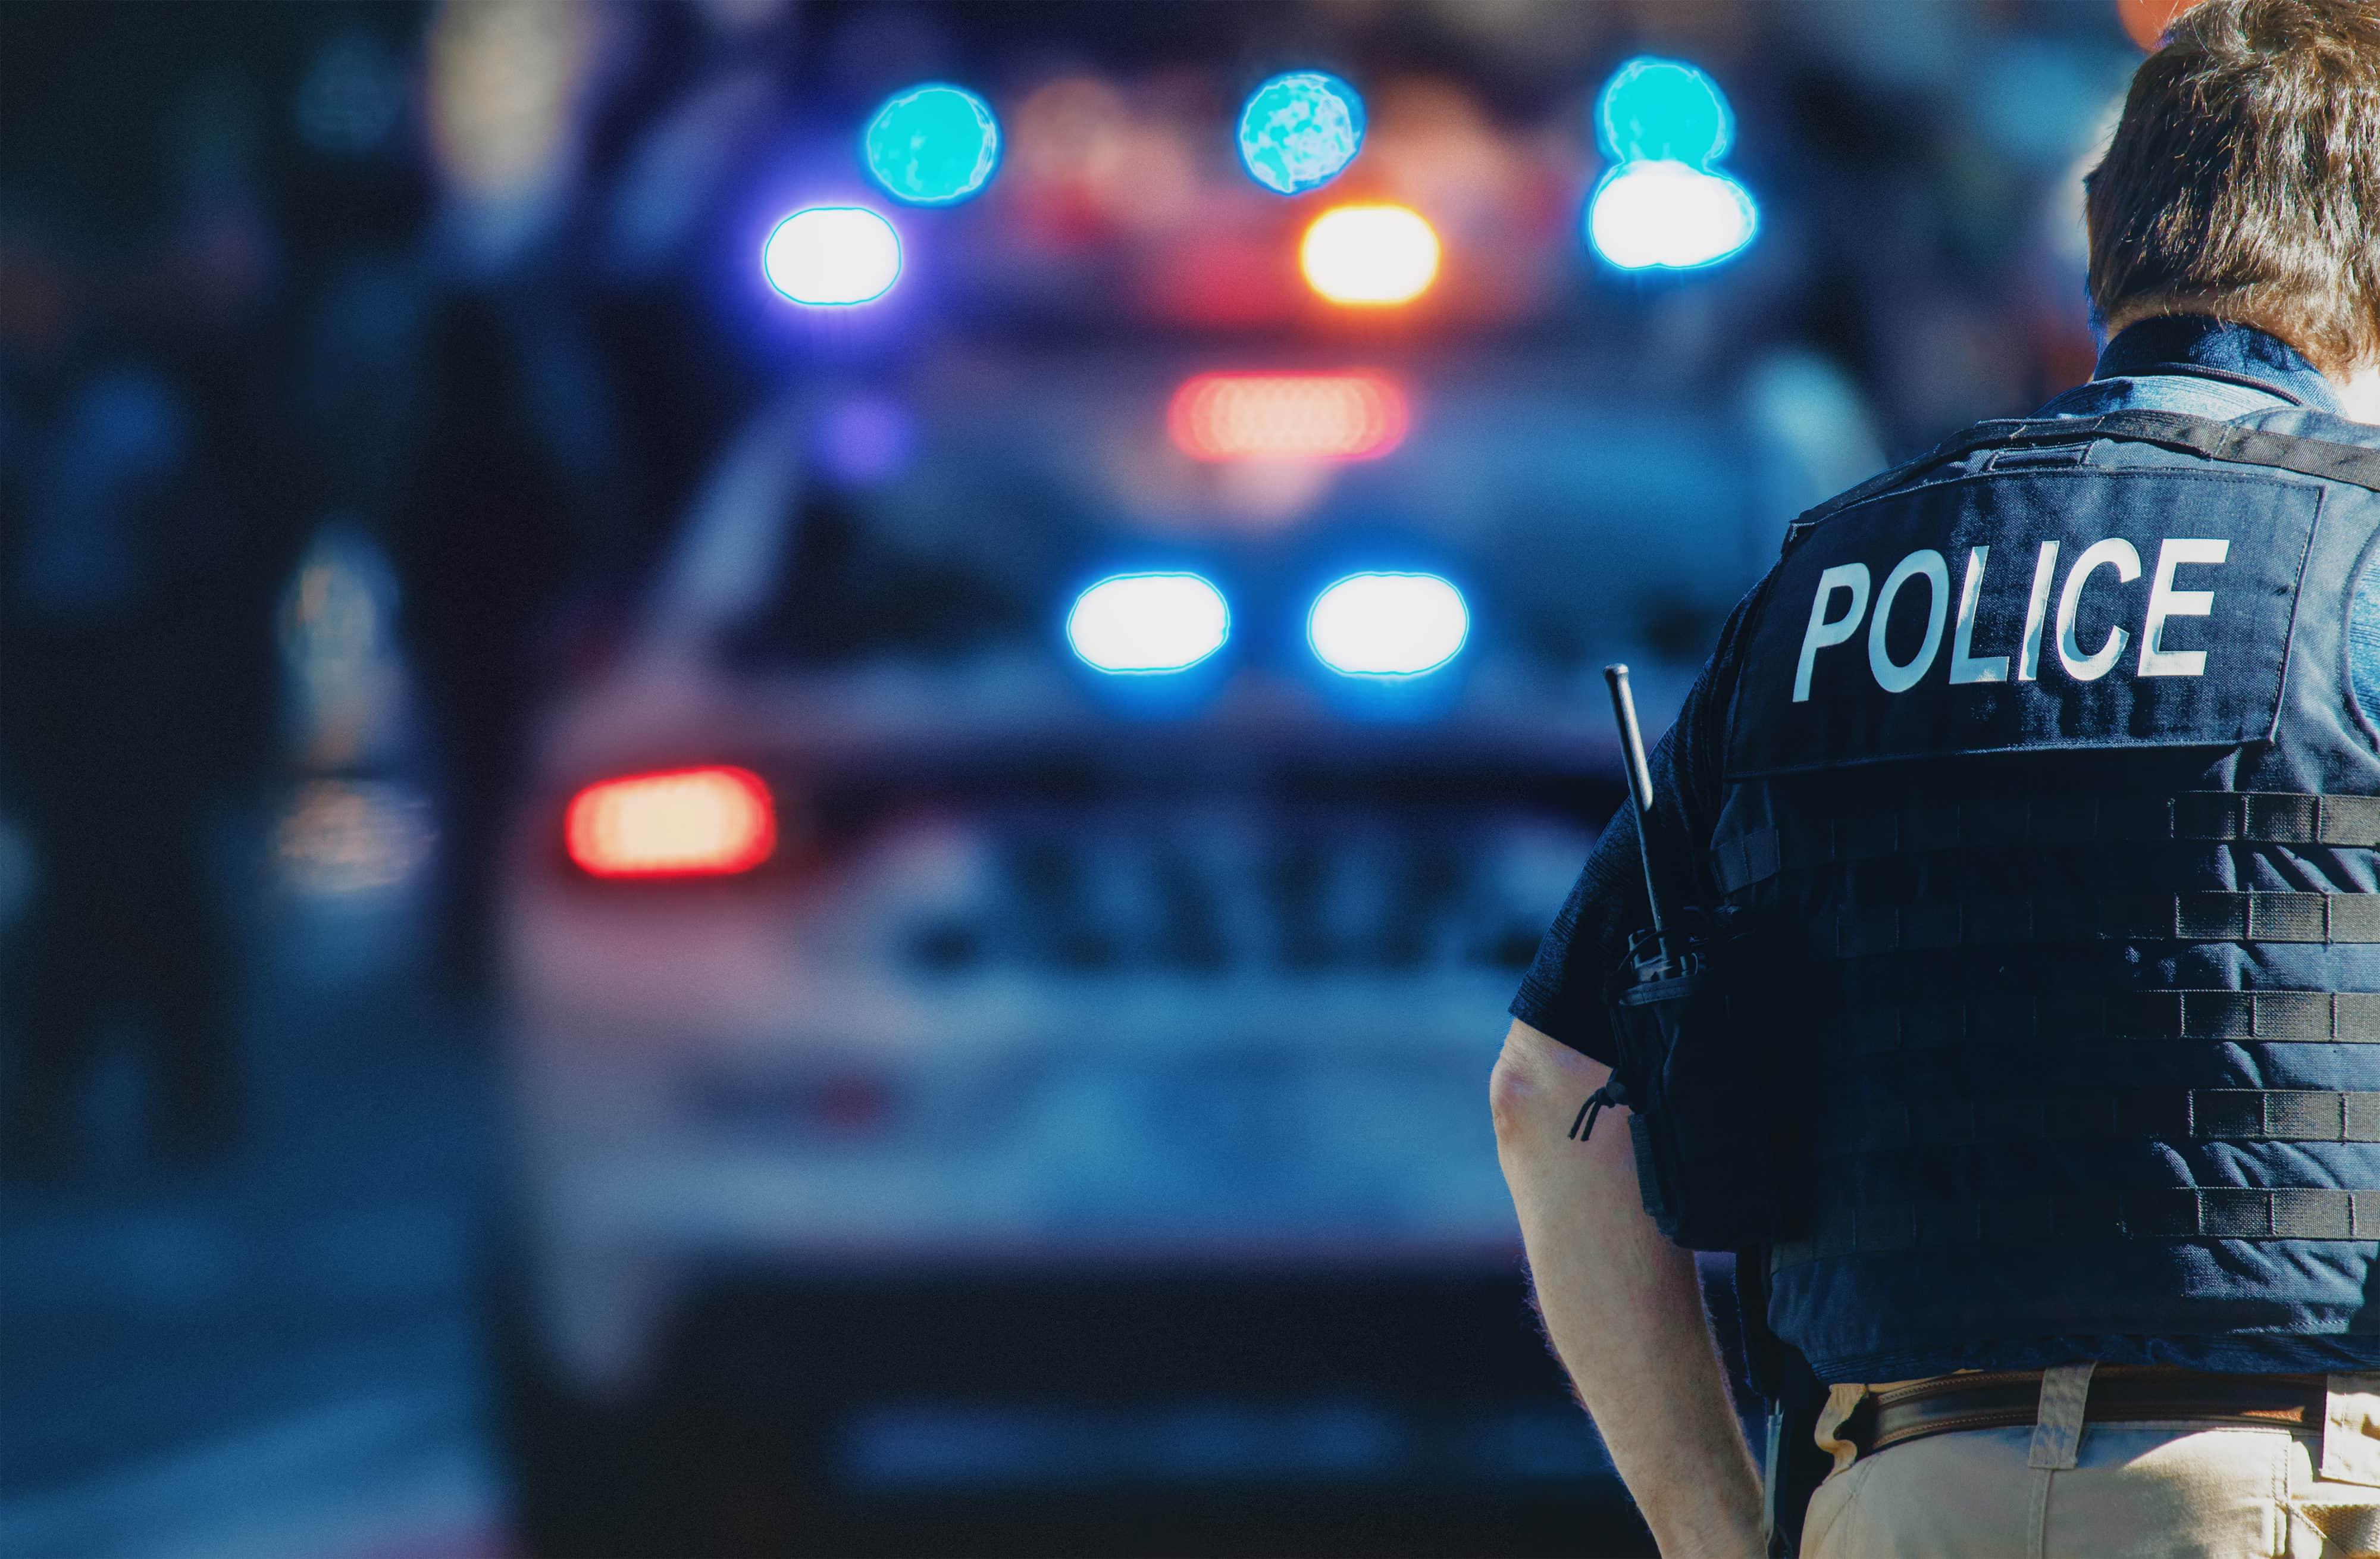 police-4000x2620.jpeg